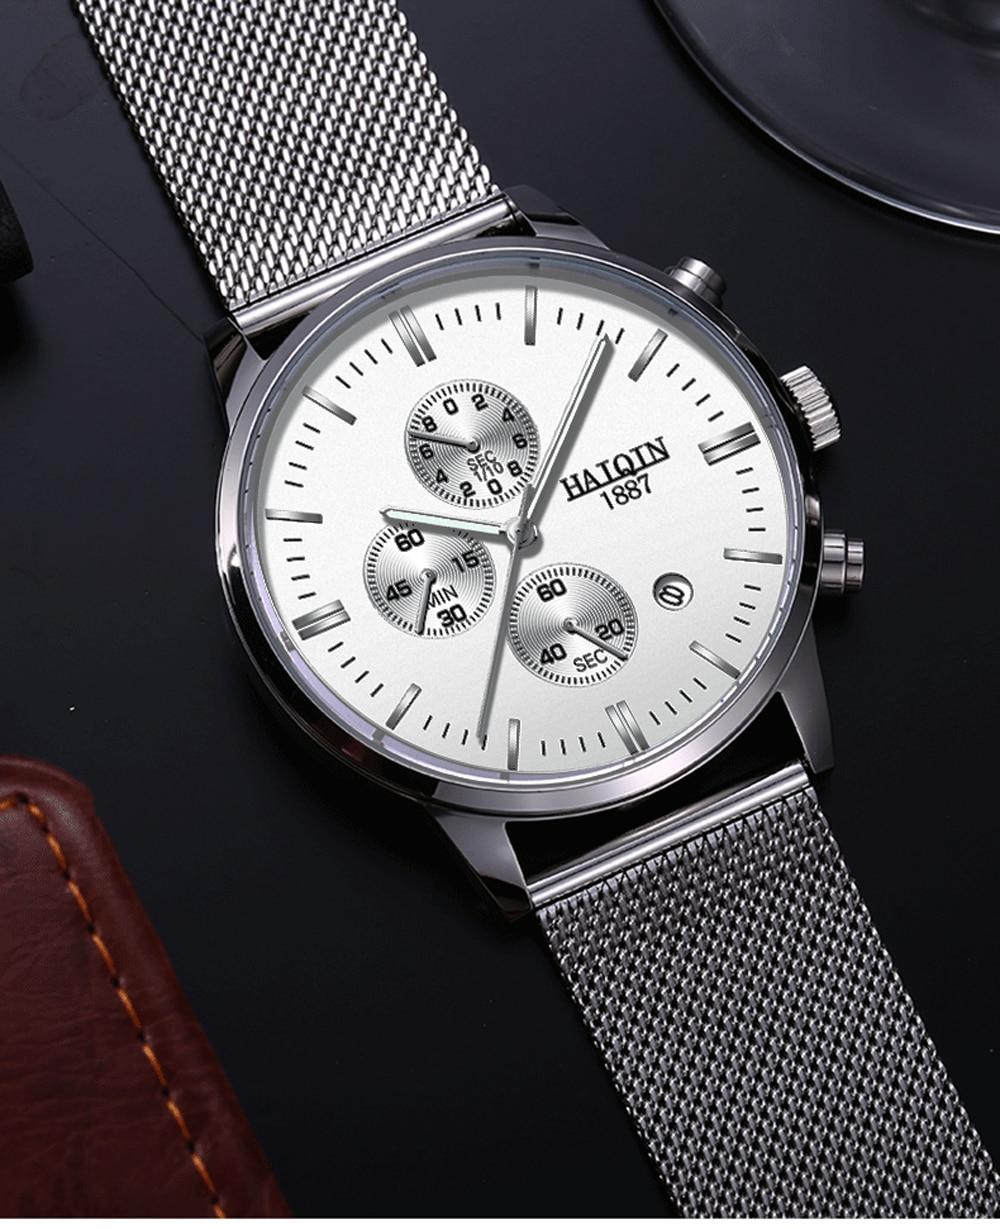 H29b73da7c1d04e13b5a3bc80f4c2077ft HAIQIN 2019 Fashion Mechanical mens watches top brand luxury sport wristwatch men waterproof Quartz mens clock Relogio Masculino